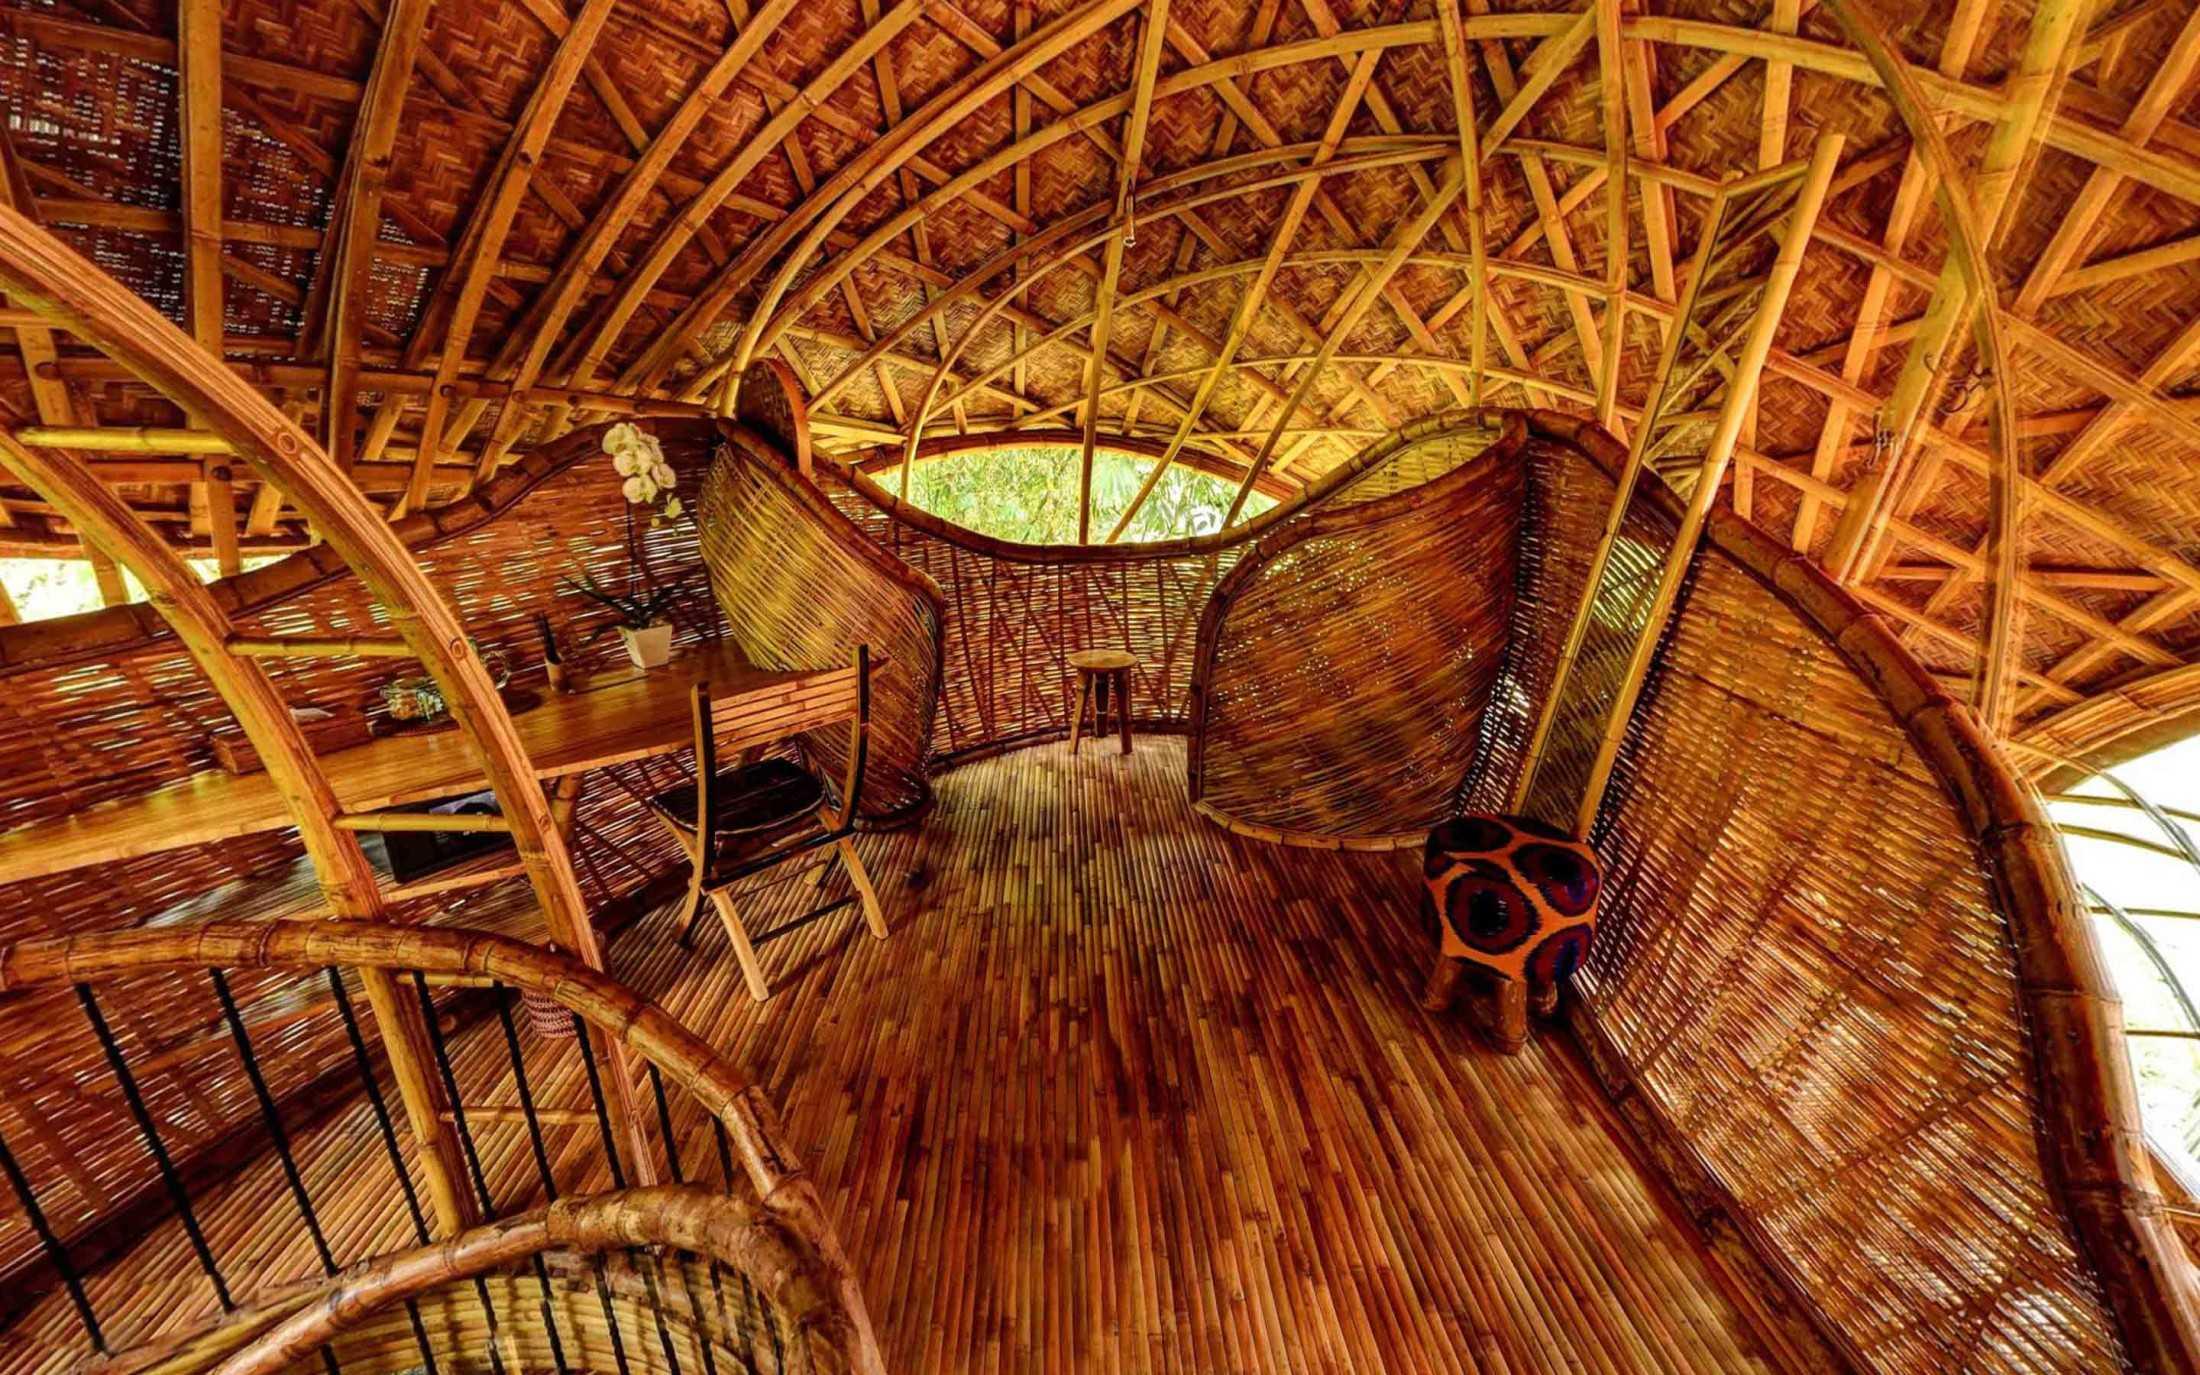 Agung Budi Raharsa | Architecture & Engineering Riverbend Bamboo House - Bali Bali, Indonesia Bali, Indonesia Agung-Budi-Raharsa-Riverbend-House-Bali  88724